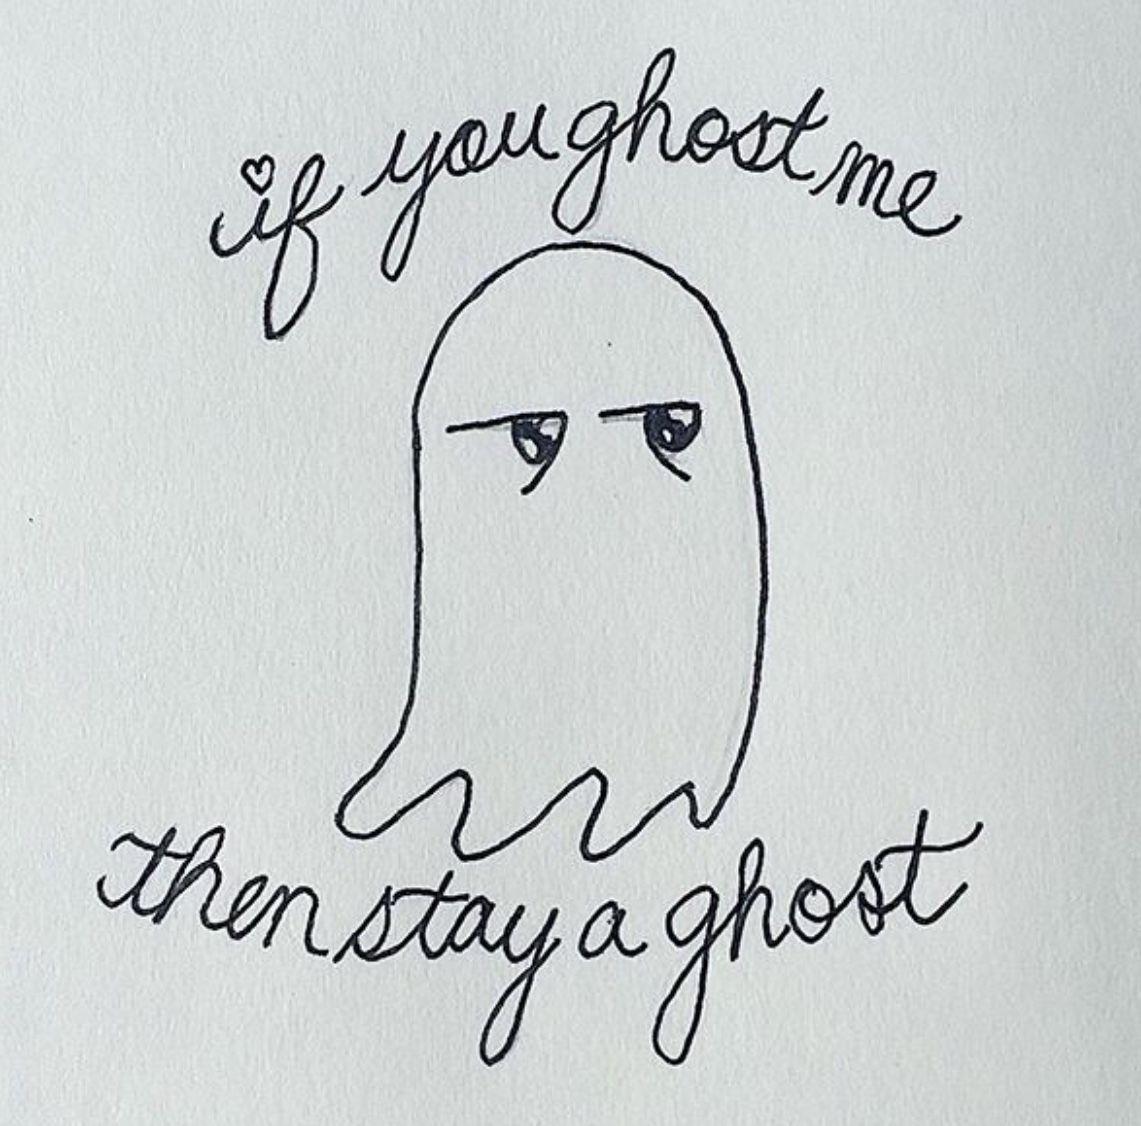 Kawaii Doodle Digital Art Cute Ghost Ghosting Tinder Comic Funny Dating Meme Humor Drawing Funny Dating Quotes Funny Comics Dating Humor